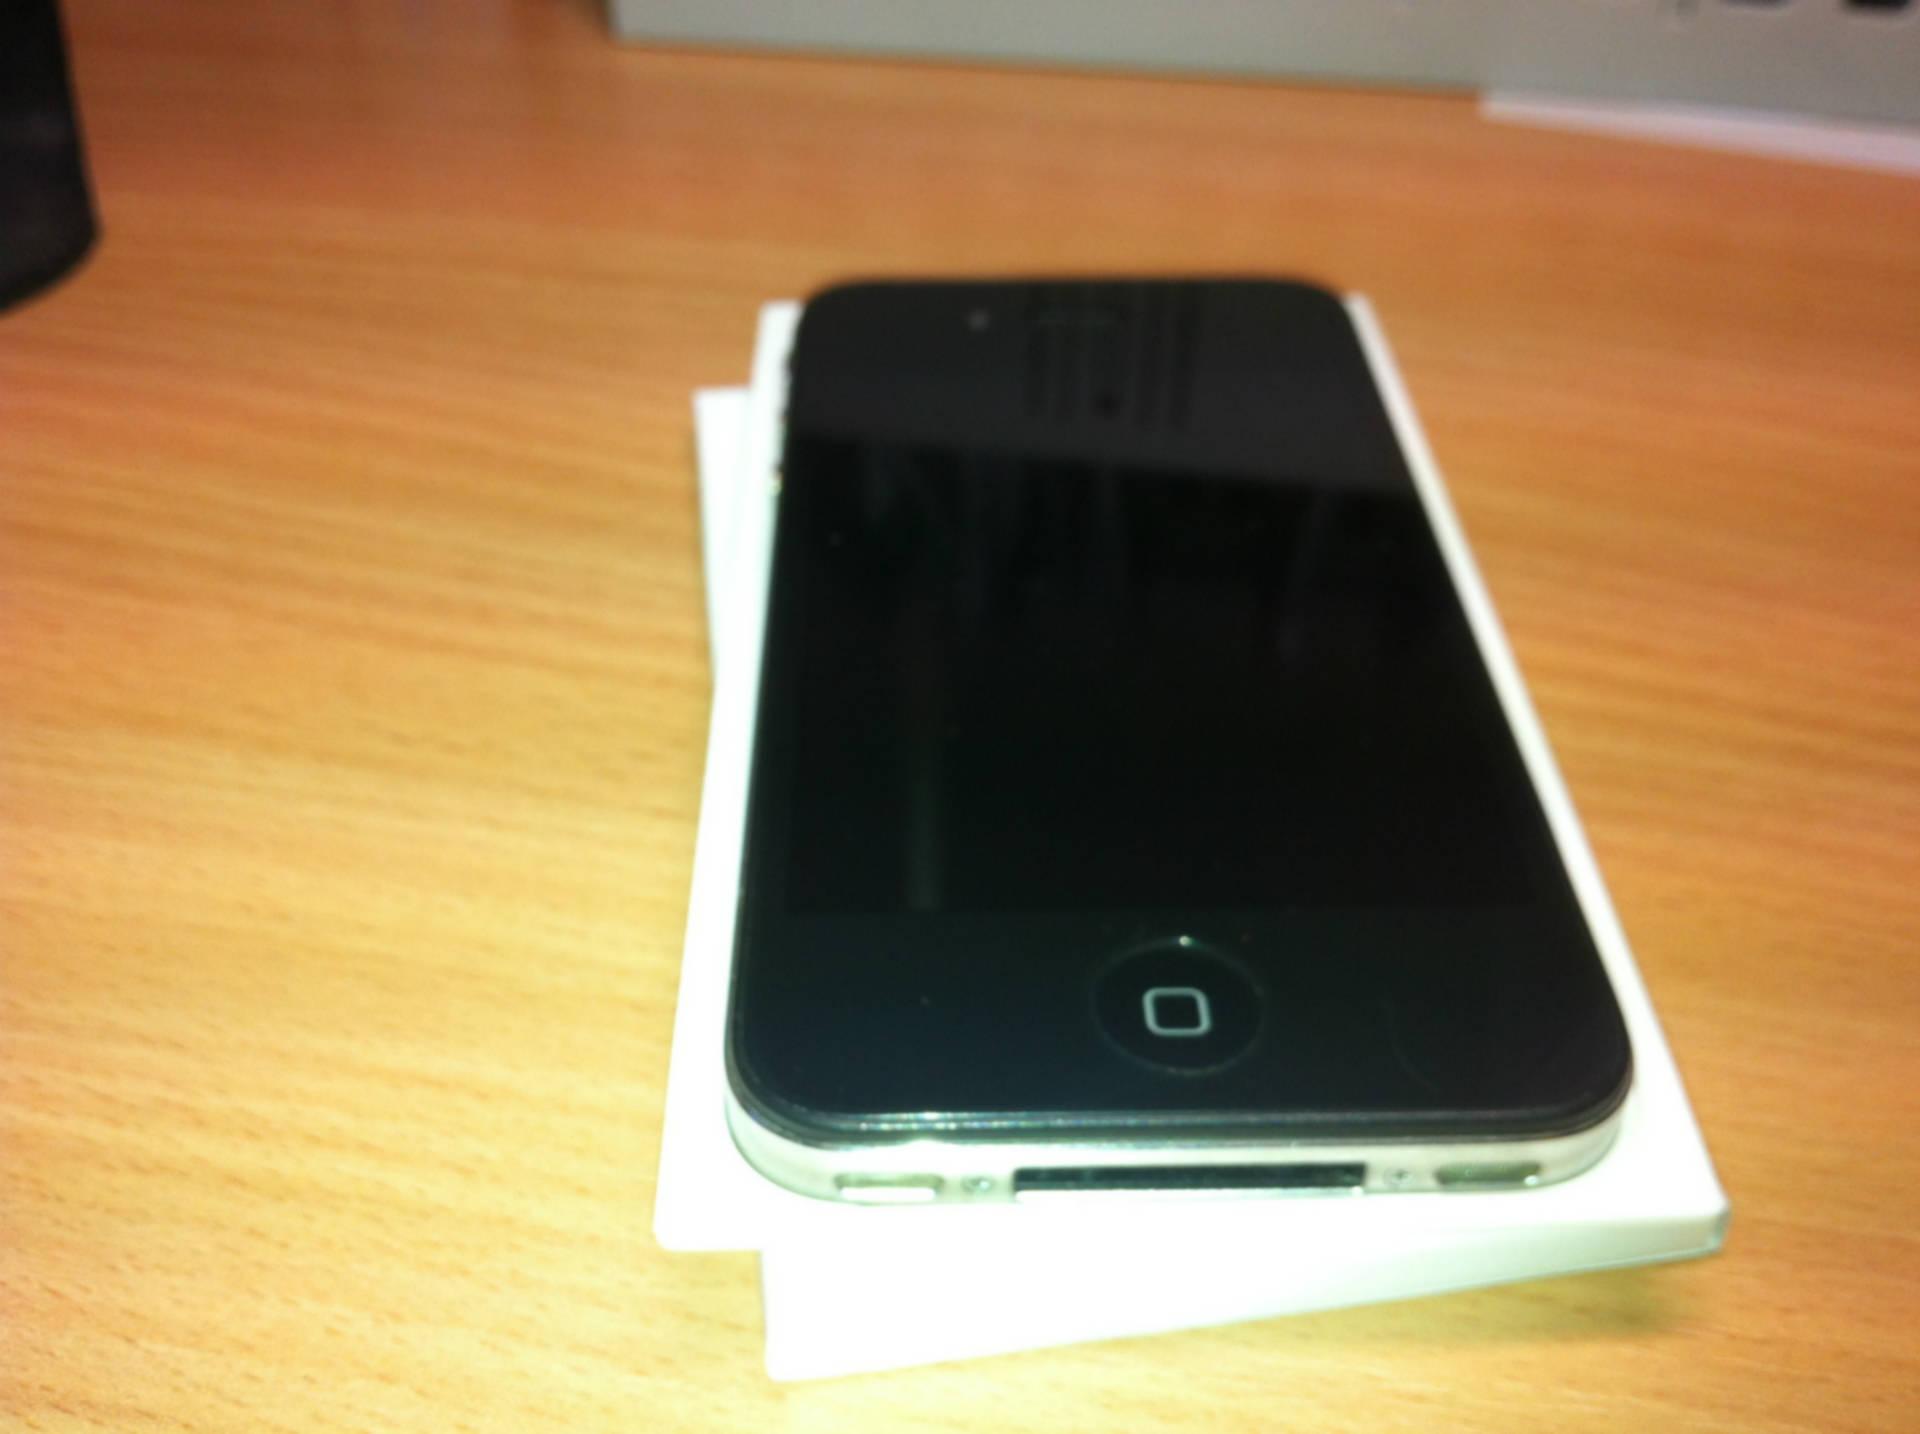 айфон 4 чёрный фото